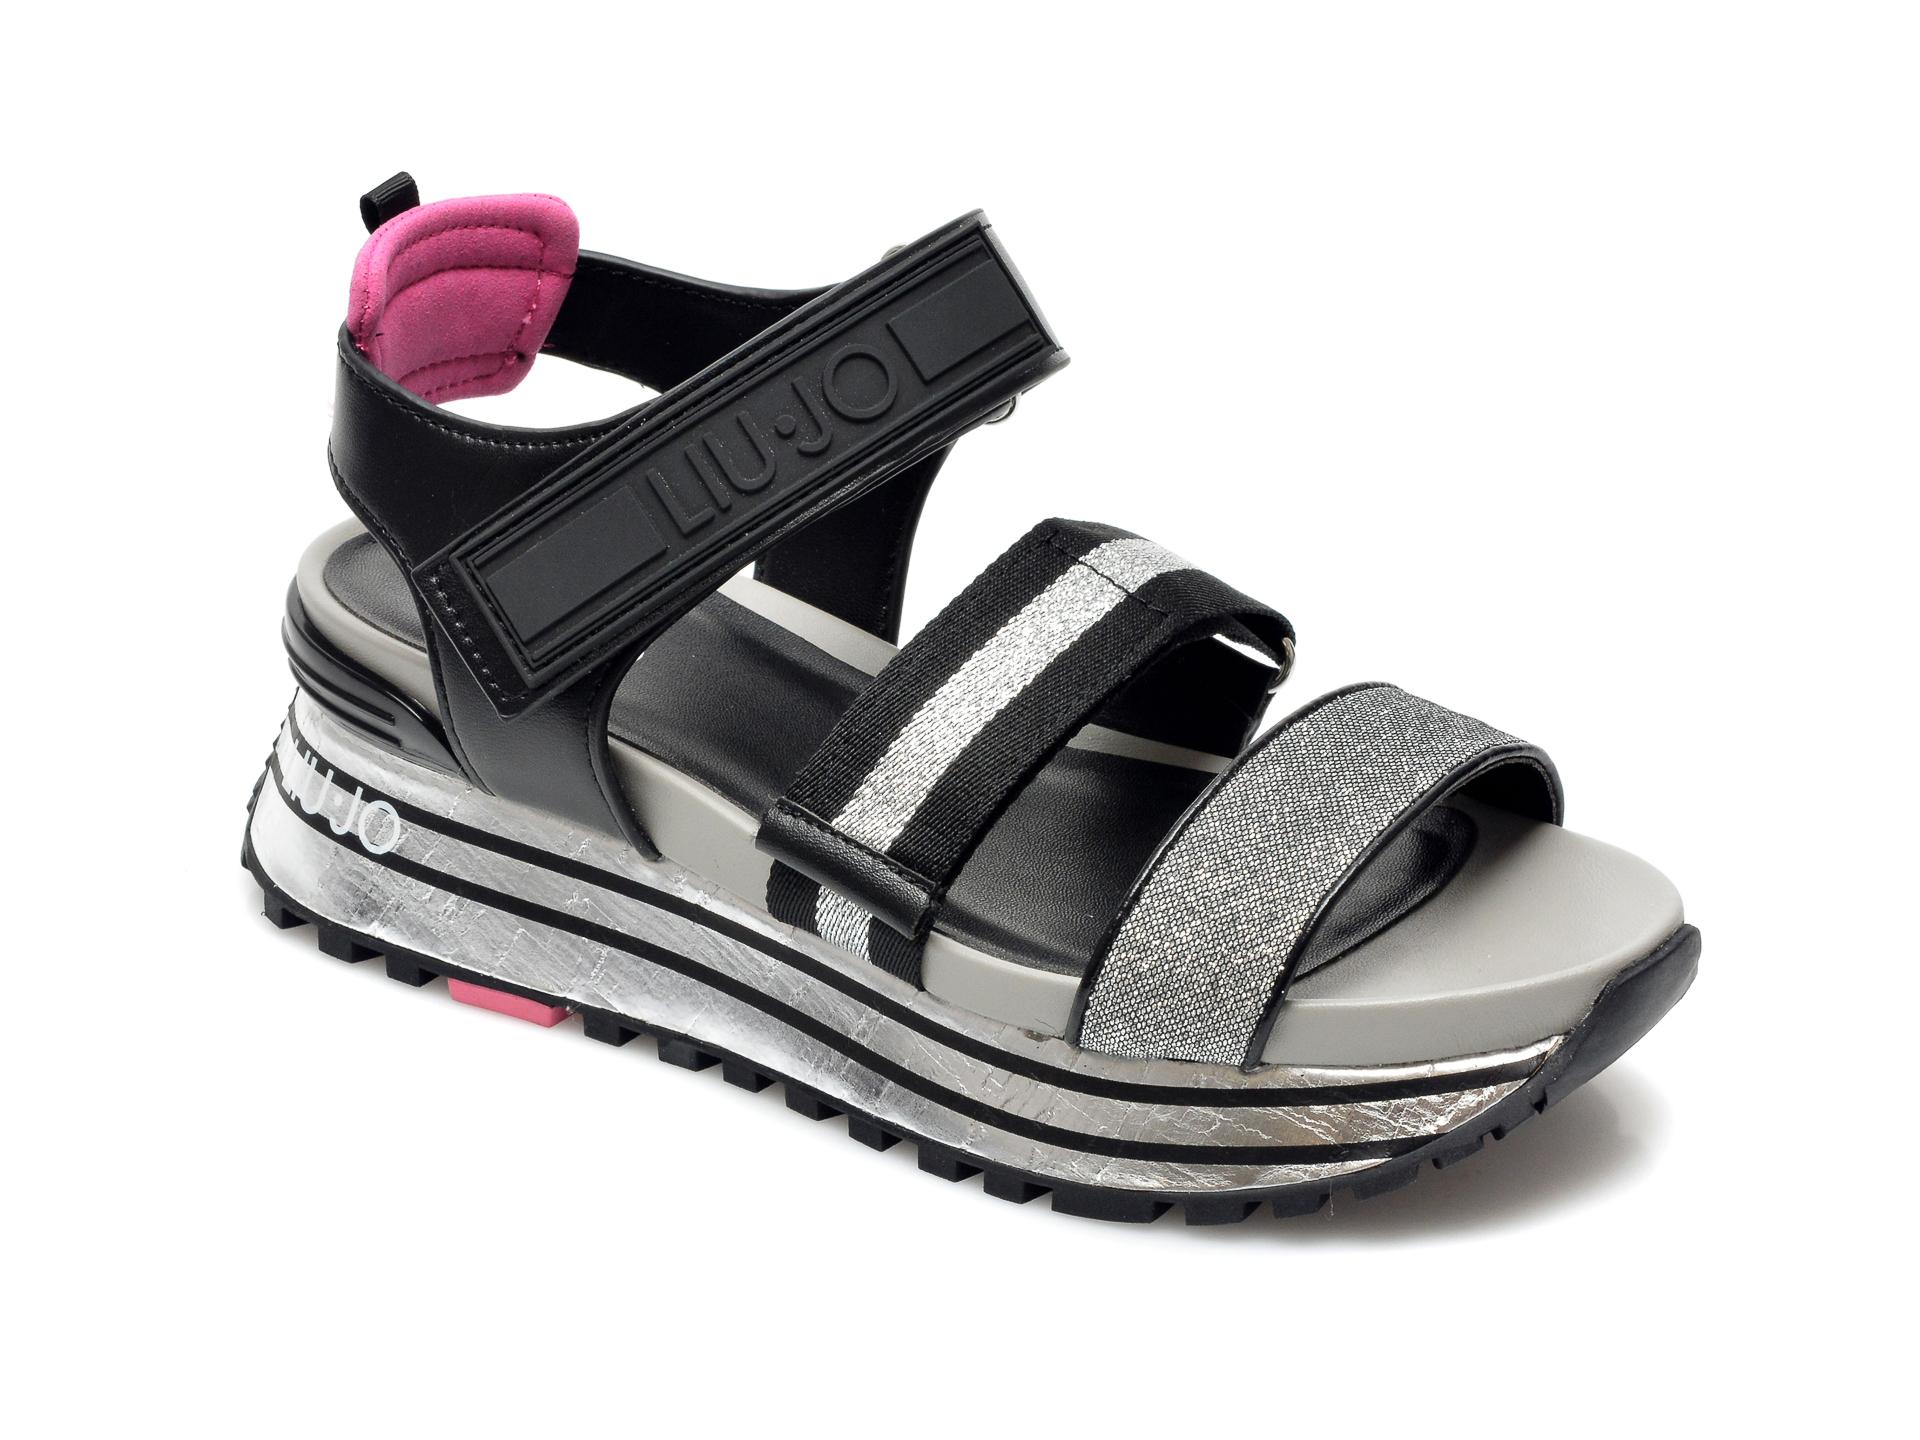 Sandale LIU JO argintii, Maxi Wonder Sandal , din material textil si piele ecologica